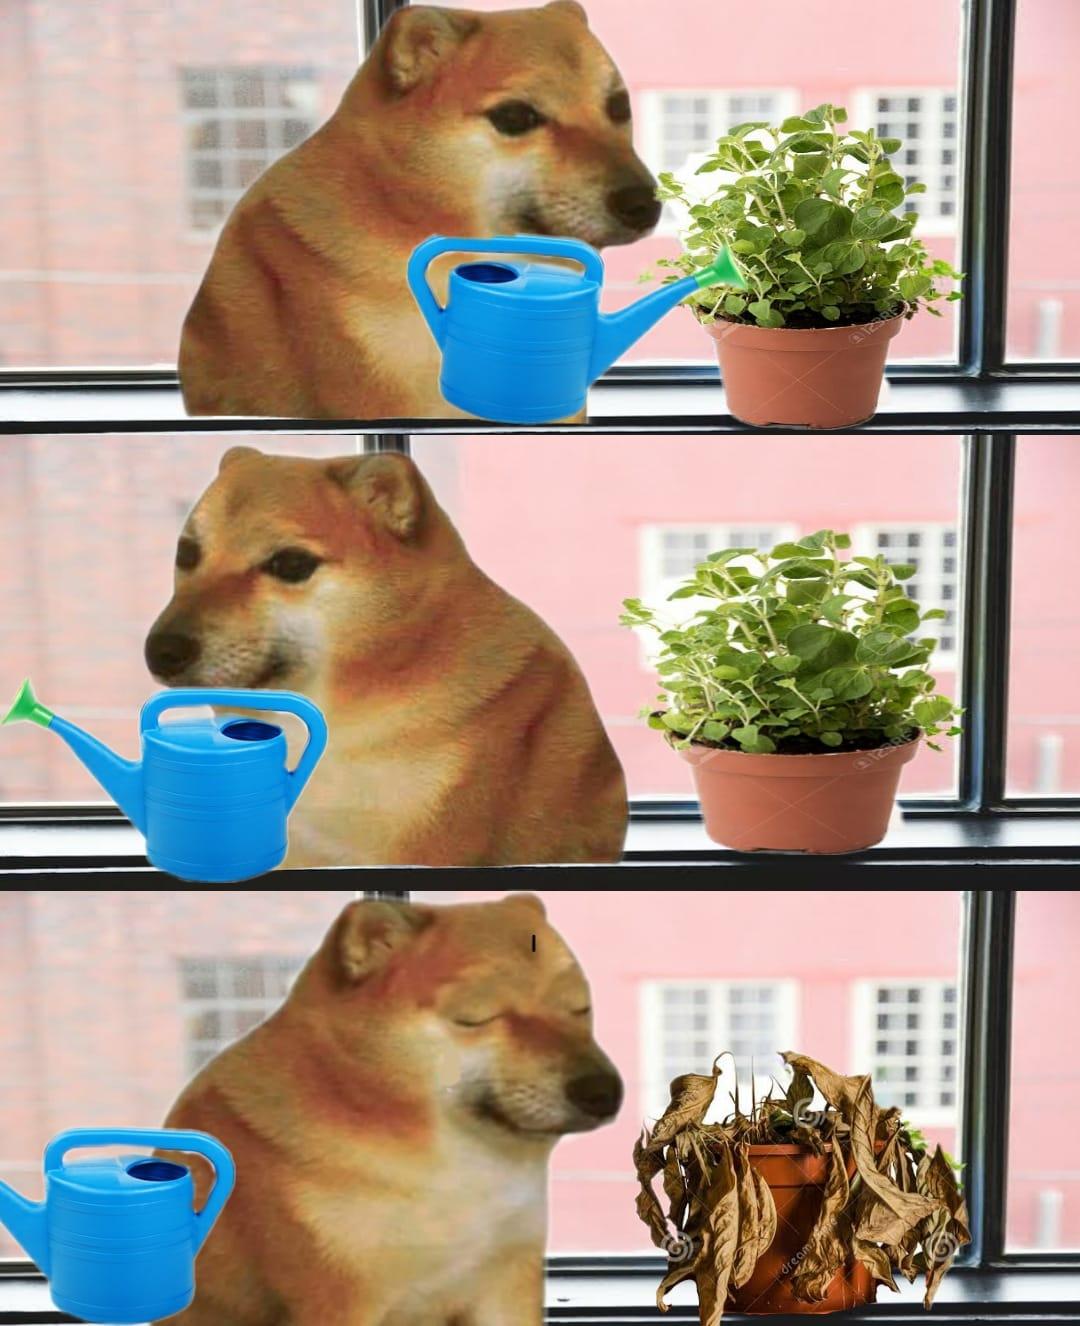 Cheems, perros, doge, memes